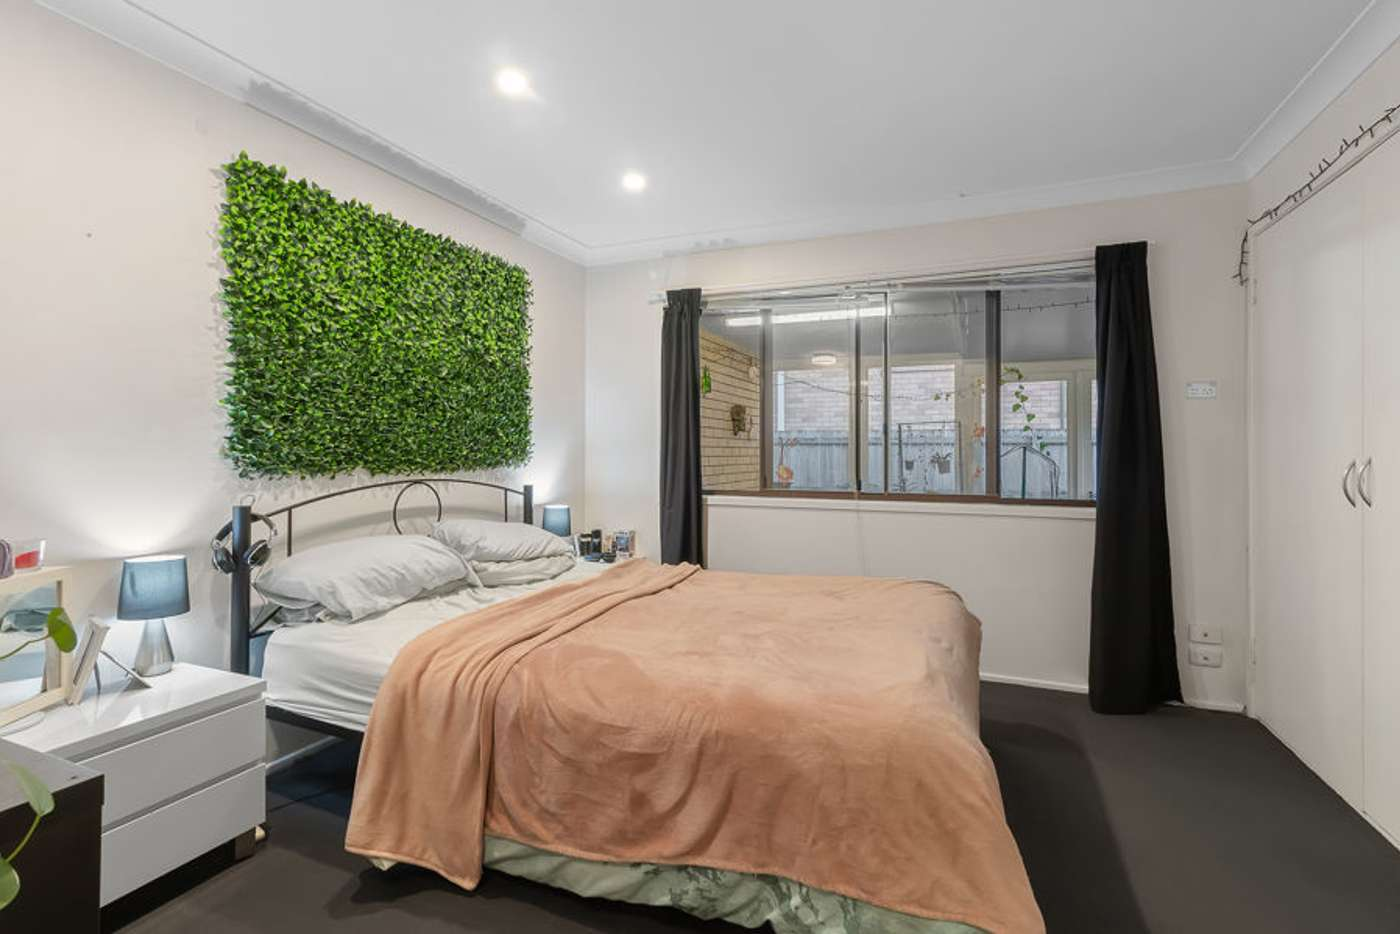 Sixth view of Homely house listing, 22 Lencol Street, Mount Gravatt QLD 4122